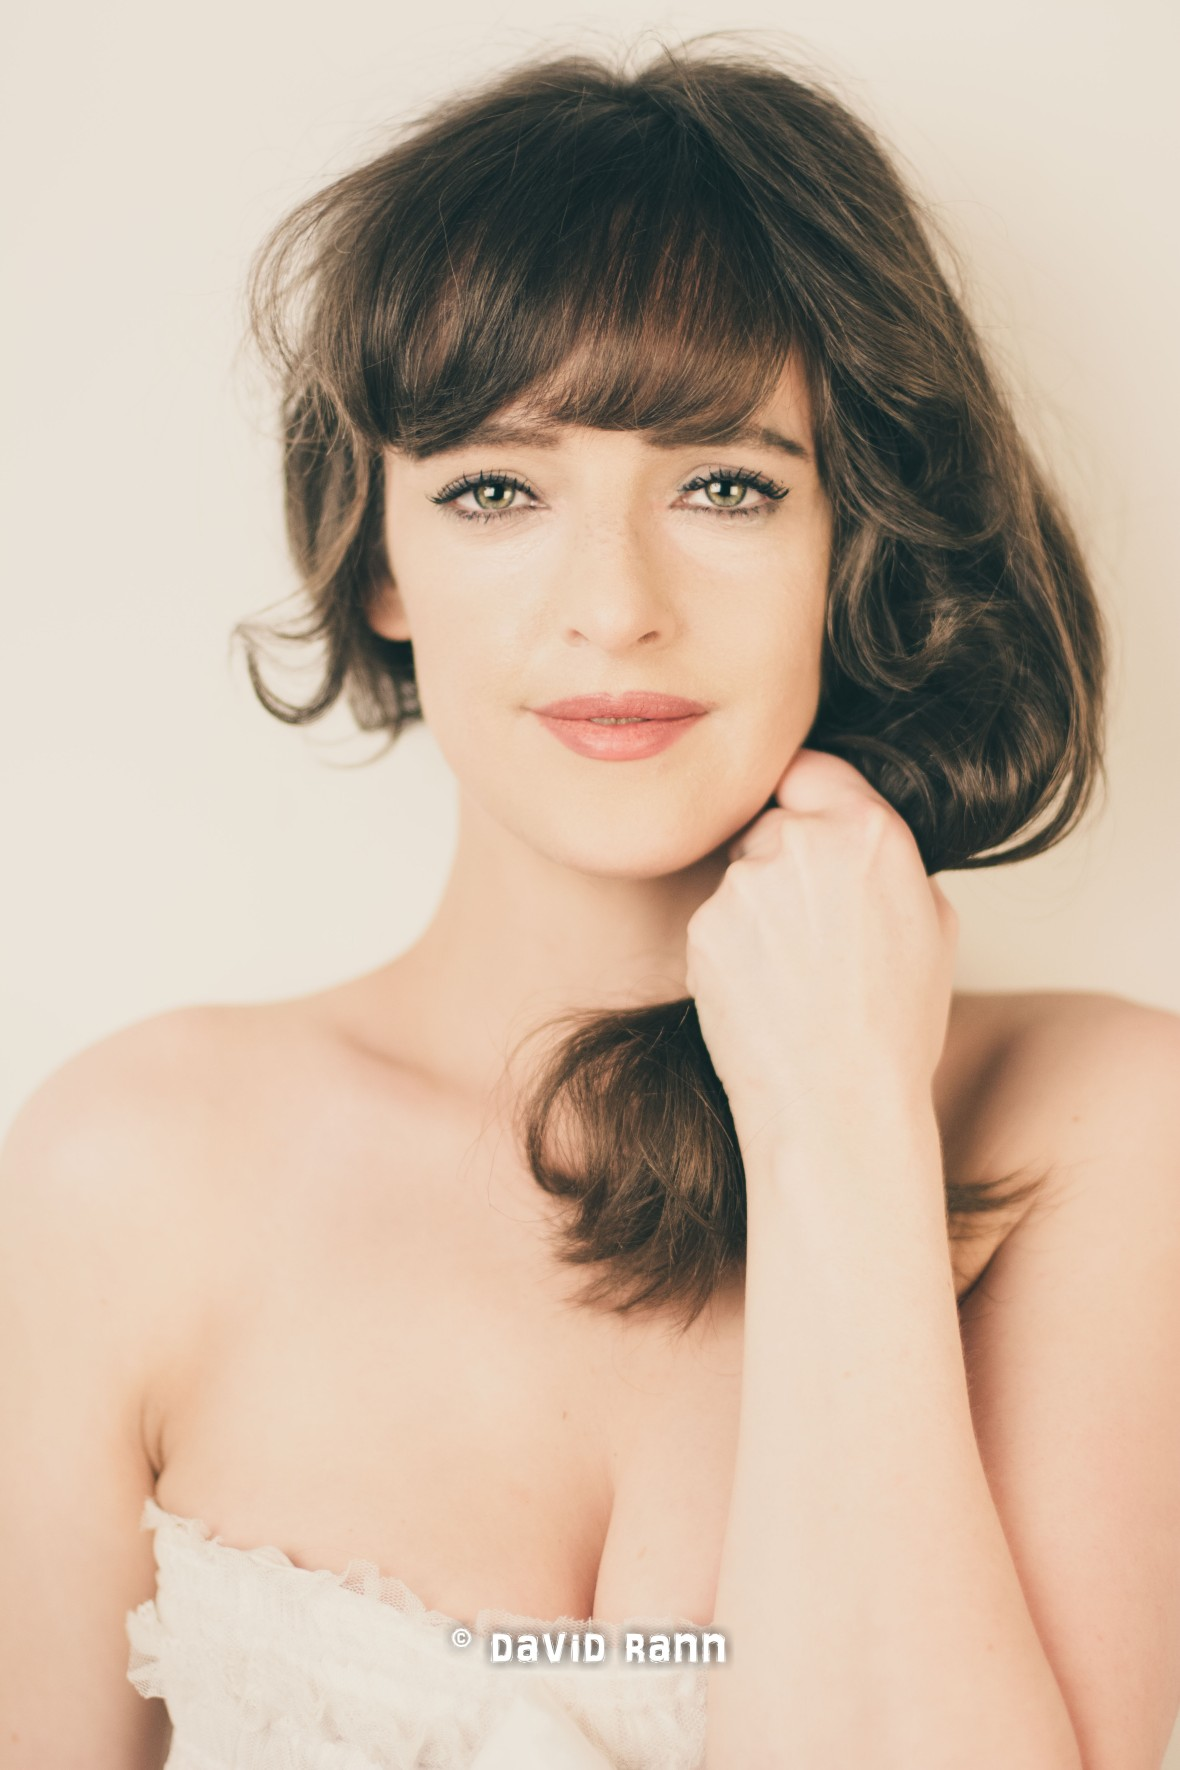 Kate Anne Cooper